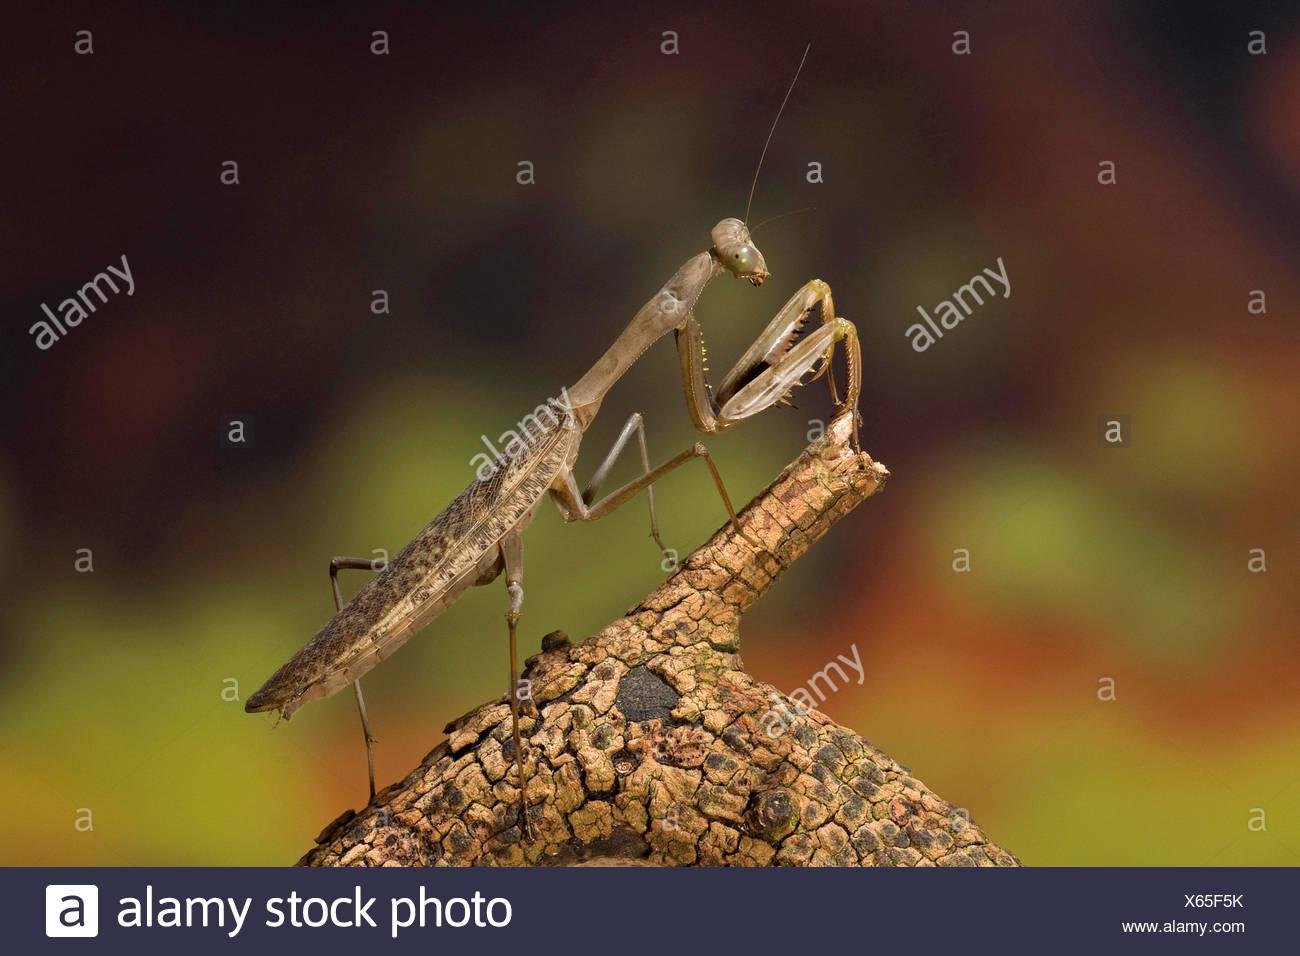 Giant Mantid (Polyspilota aeruginosa), on a branch Stock Photo